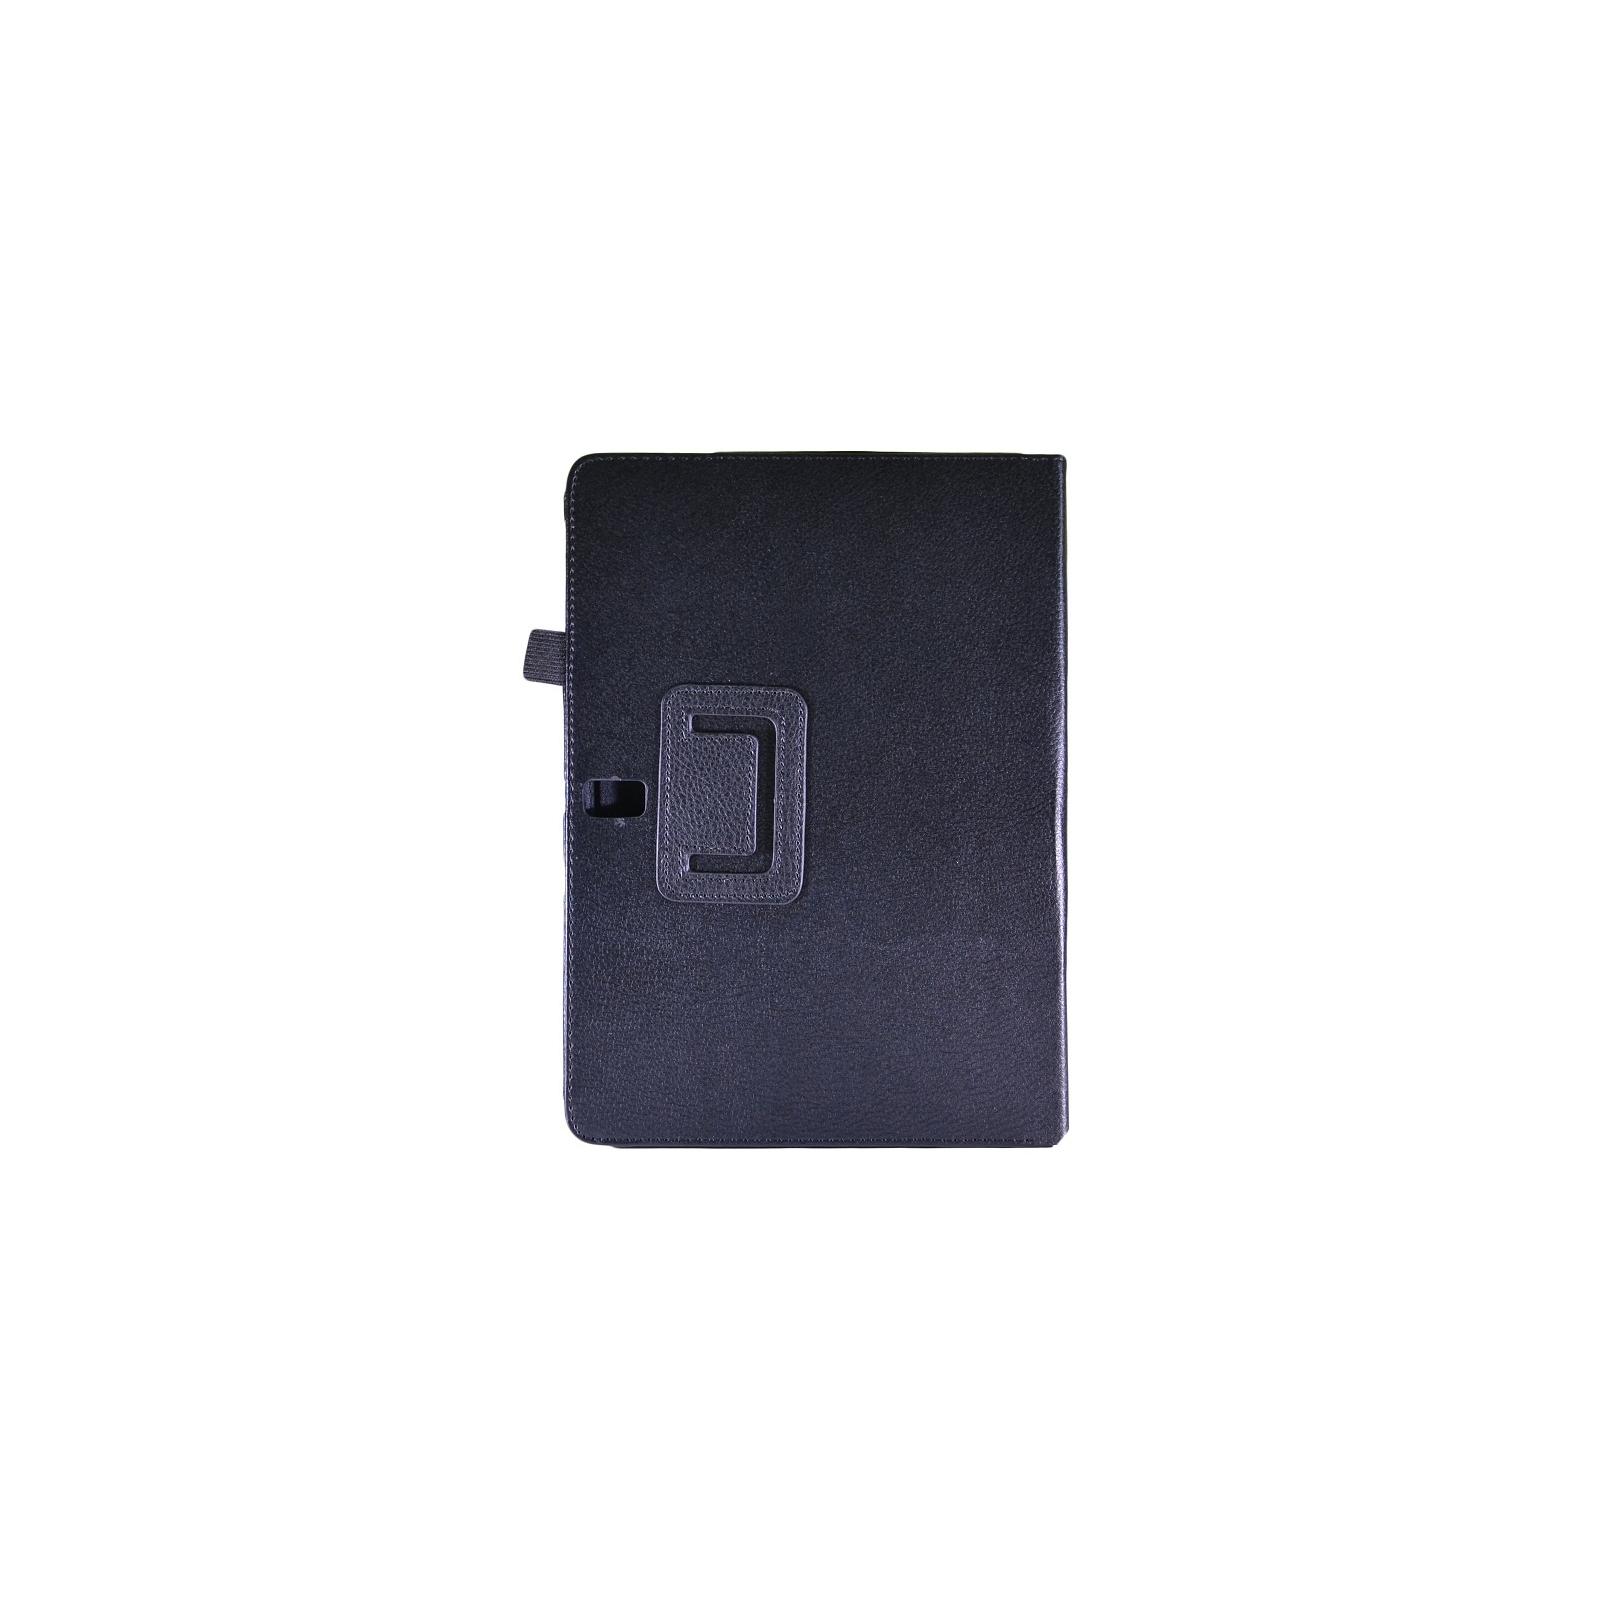 "Чехол для планшета Pro-case 10,5"" SM-T800 Galaxy Tab S 10.5 black (SM-T800b) изображение 2"